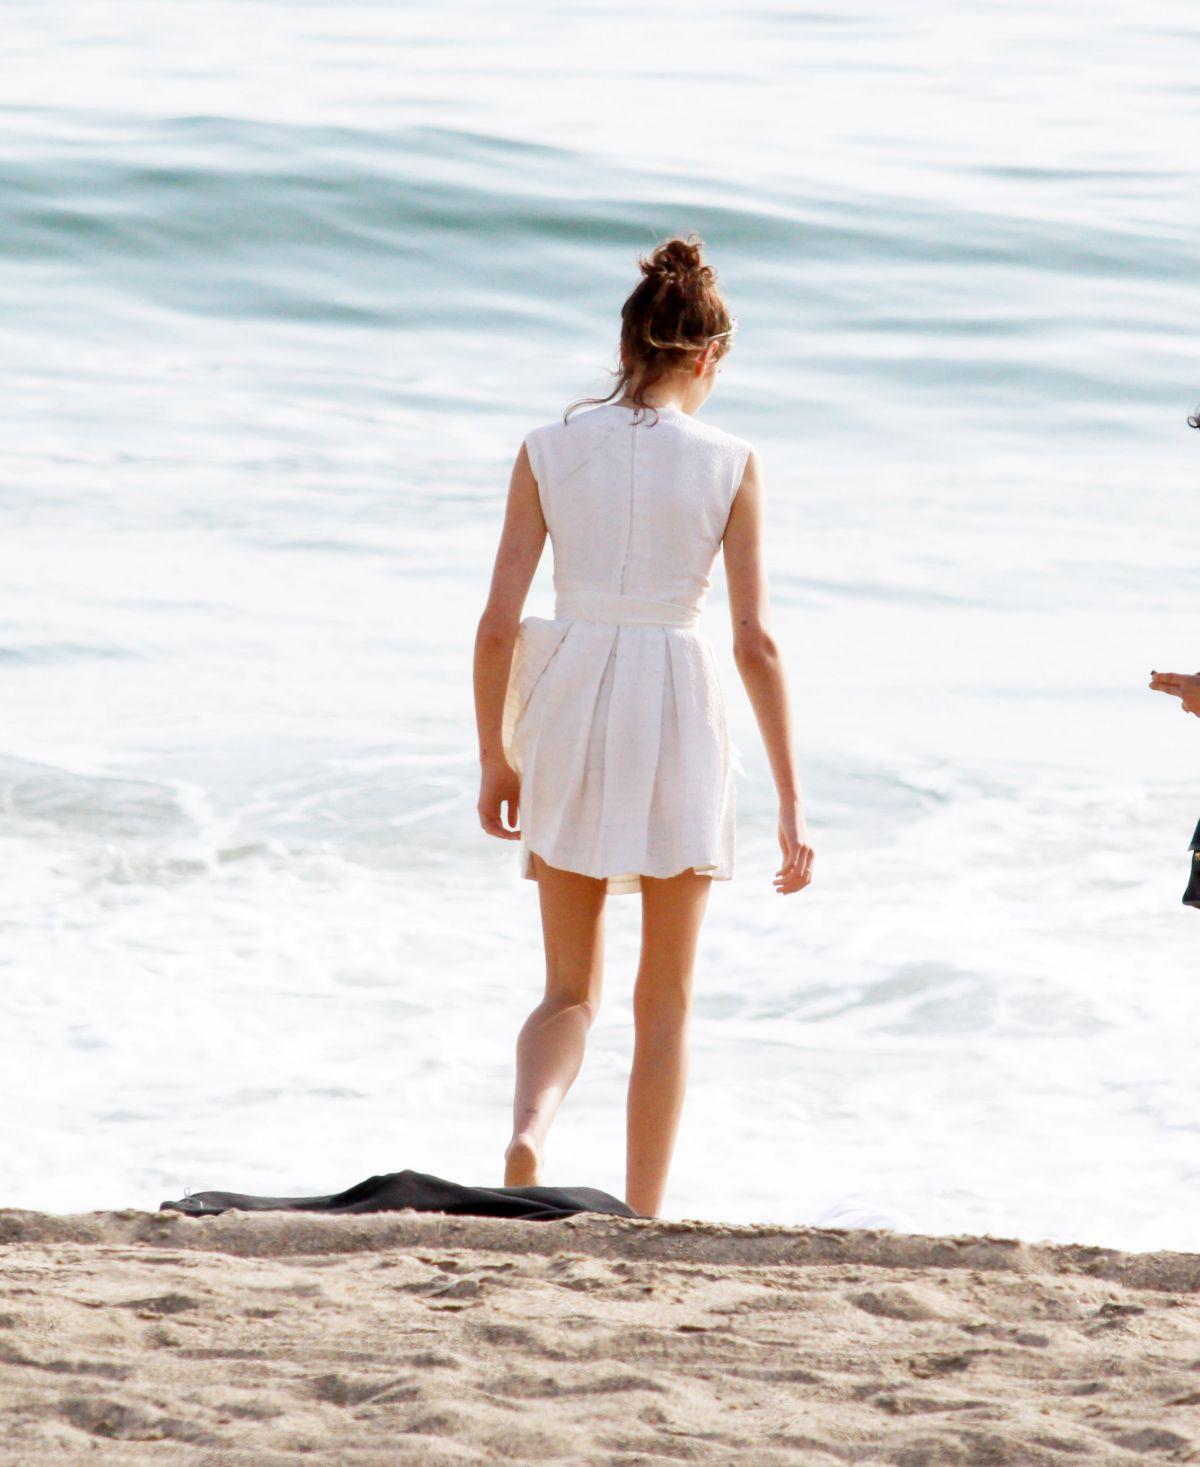 KAIA GERBER At A Photoshoot For Marc Jacobs Daisy Perfume